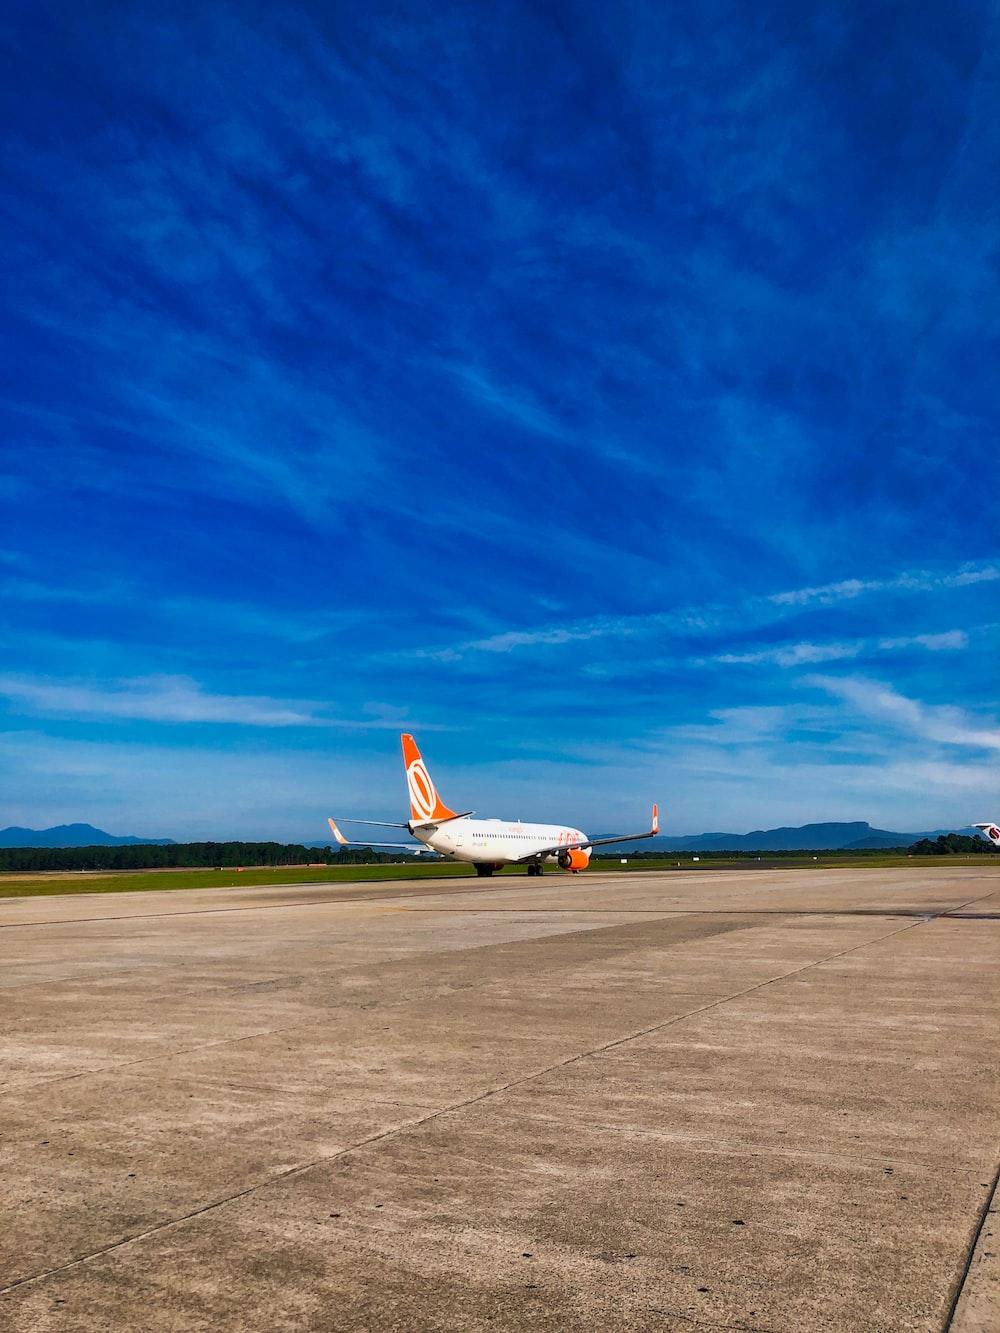 white and orange passenger airplane landing under blue and white sky